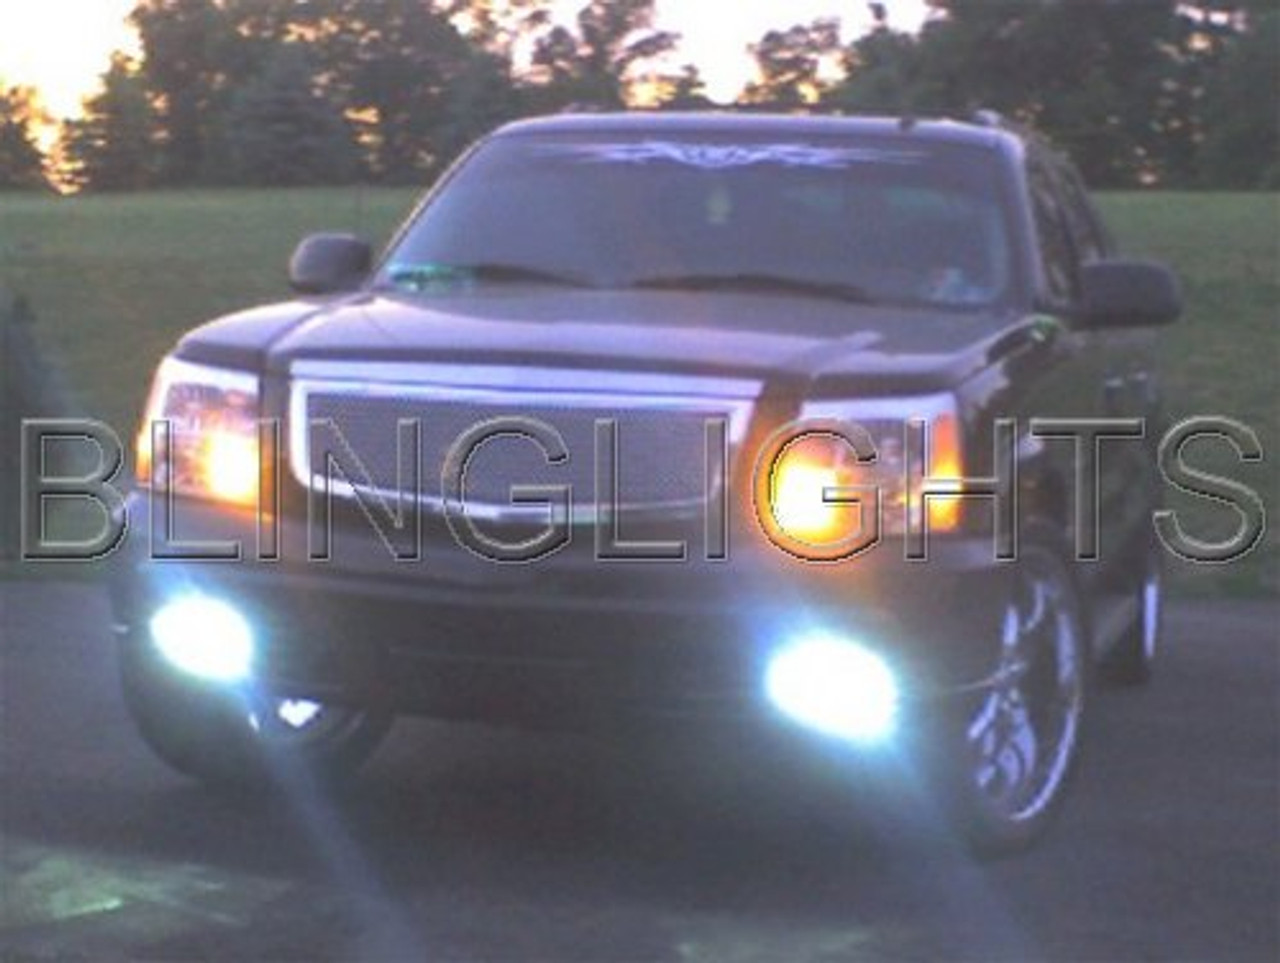 2002 2003 2004 2005 2006 Cadillac Escalade Xenon HID Conversion Kit Fog Lamps Driving Lights ESV EXT